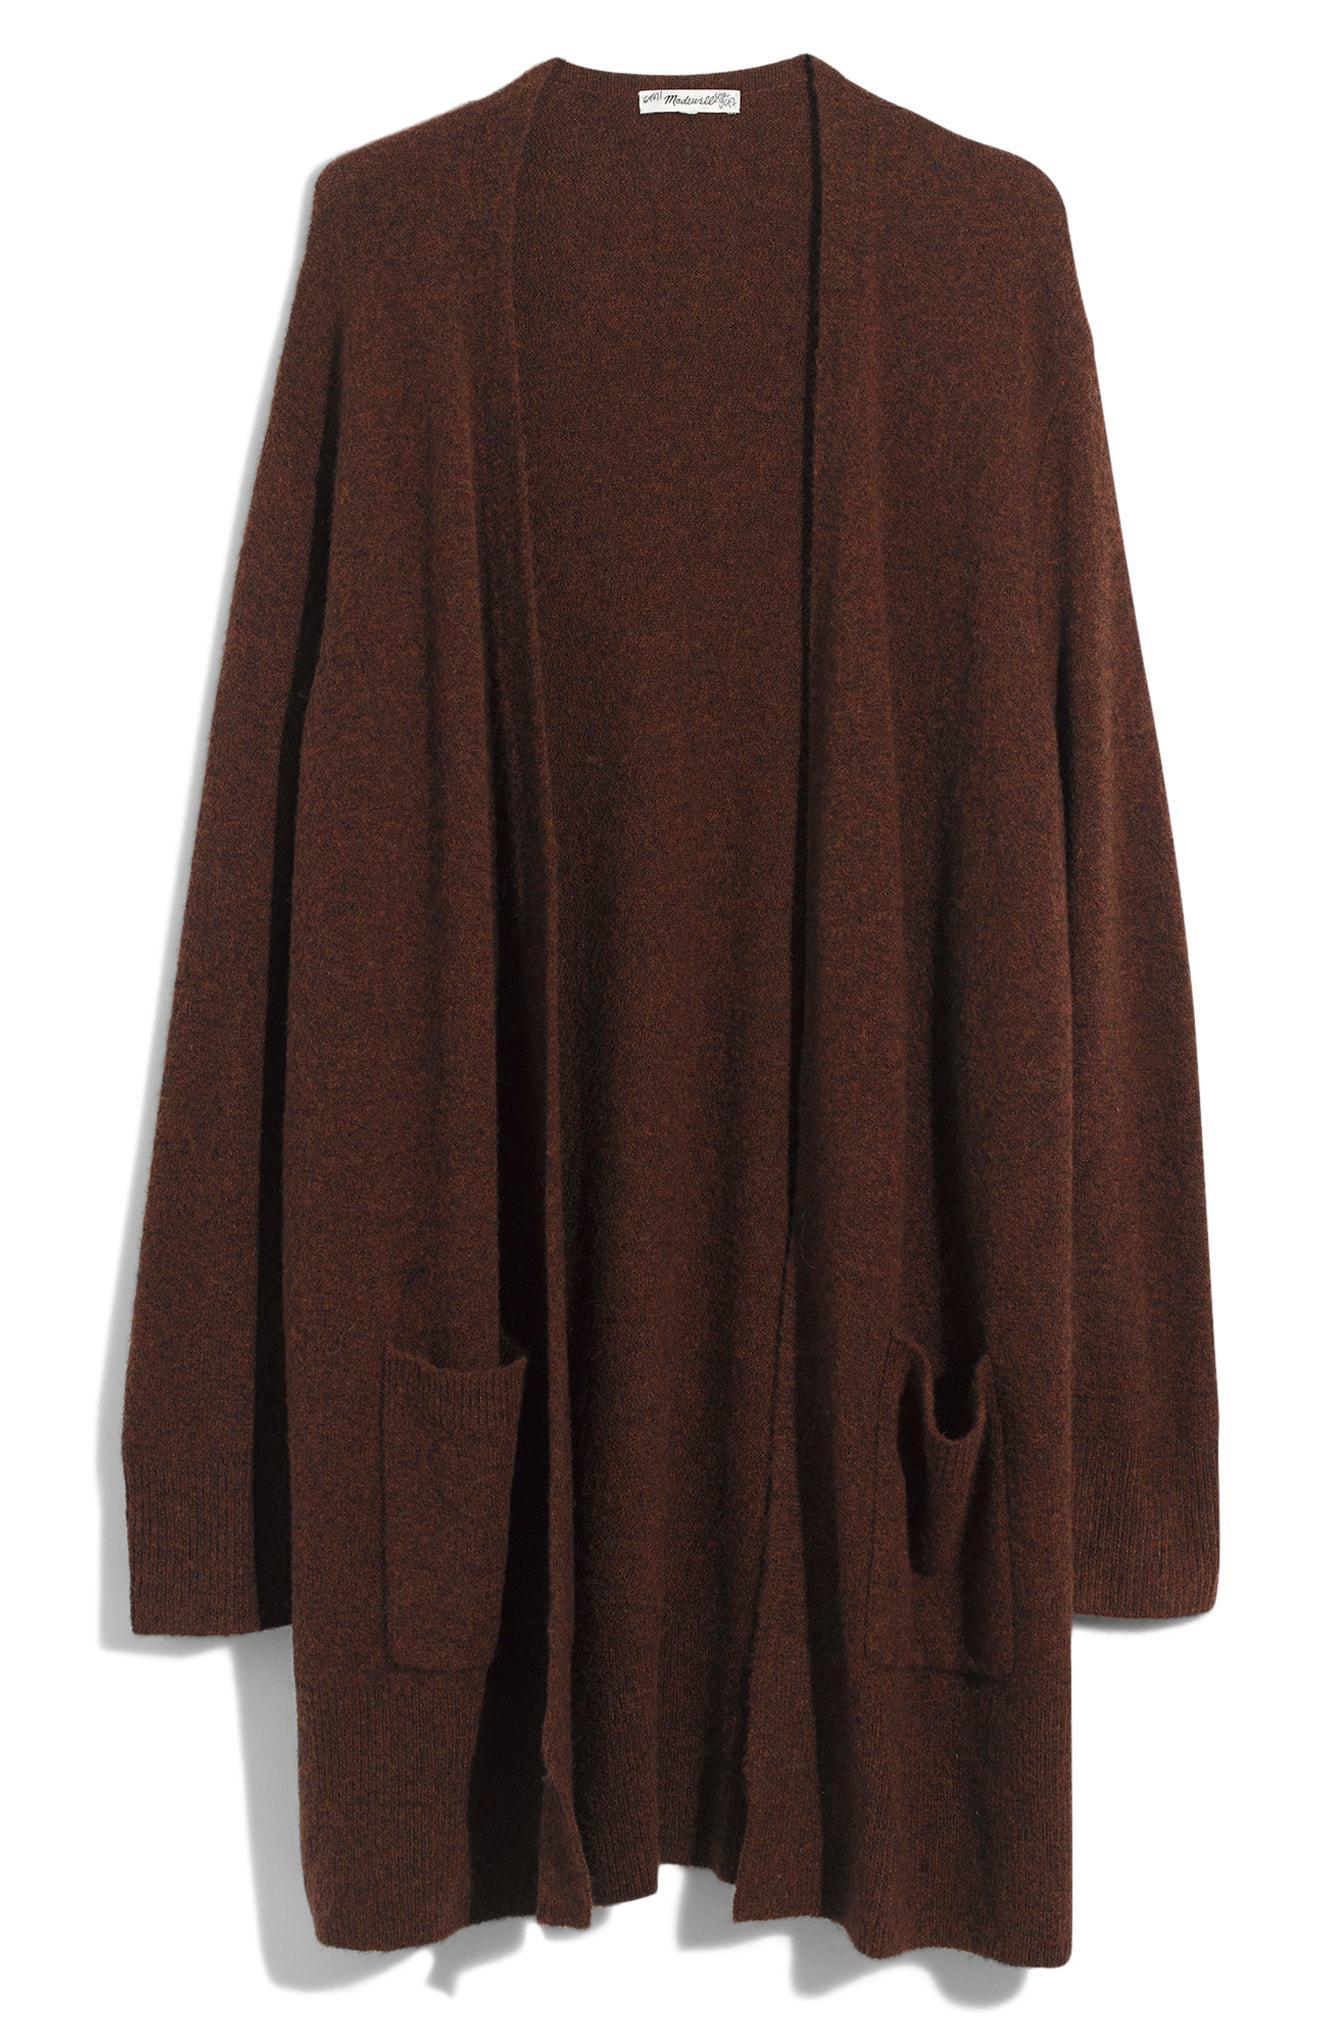 35f1684c753 Lyst - Madewell Kent Cardigan Sweater in Brown